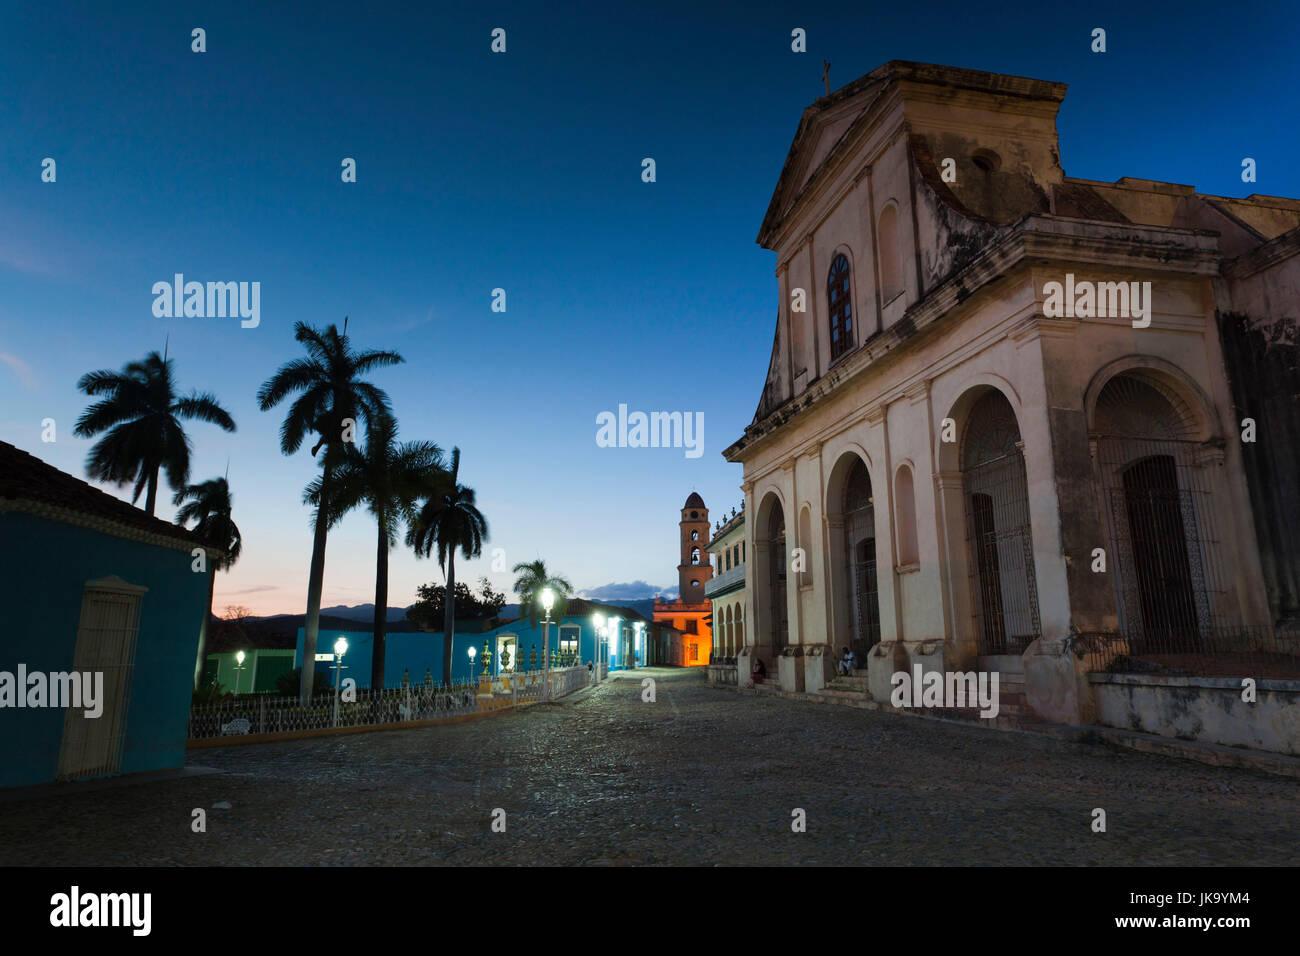 Cuba, Sancti Spiritus Province, Trinidad, Iglesia Parroquial de la Santisima Trinidad, Holy Trinity Church, dusk - Stock Image